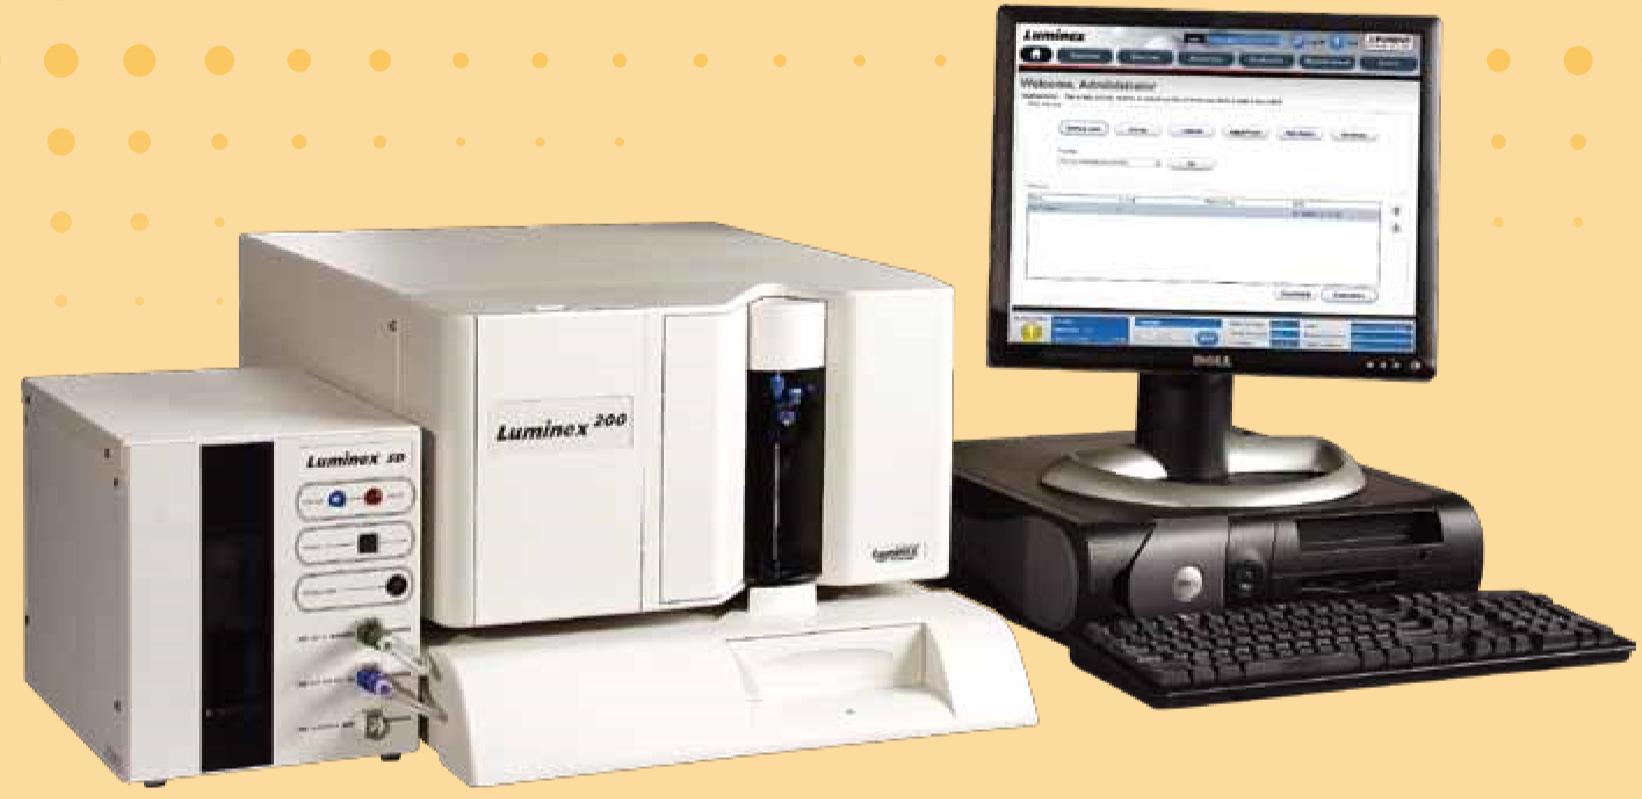 Luminex 200高通量液相悬浮芯片系统